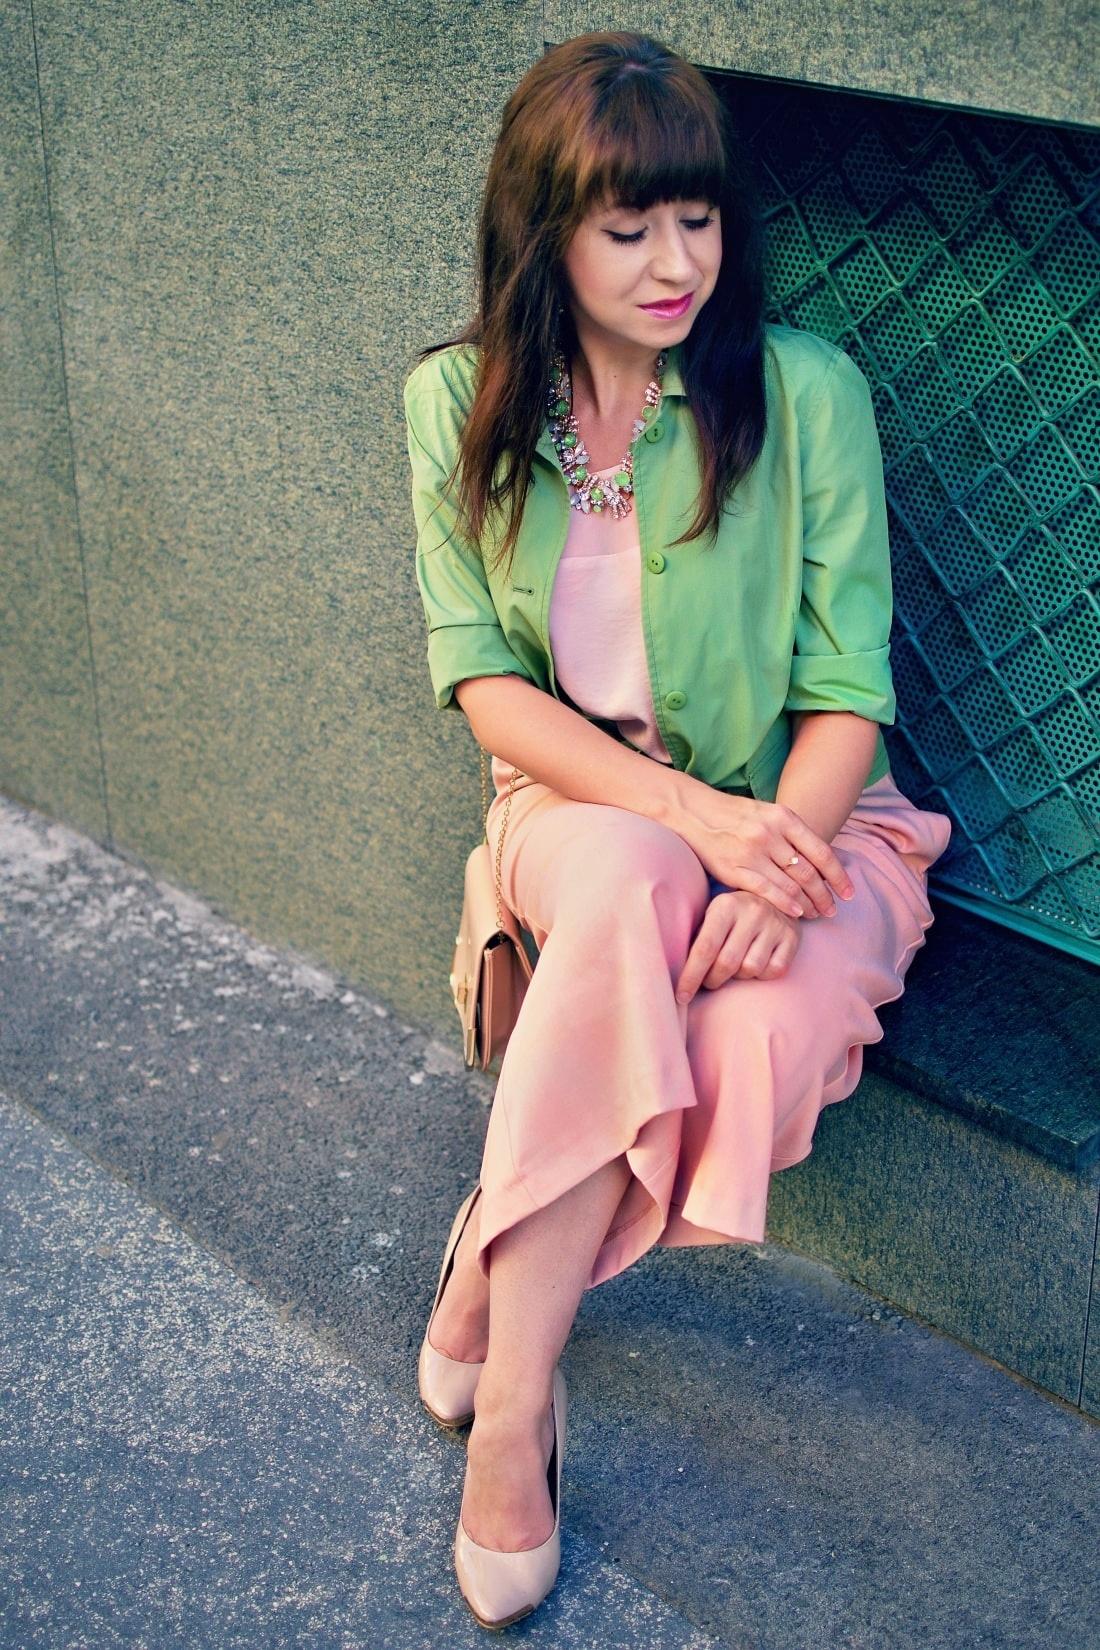 Culottes_Katharine-fashion is beautiful blog 2_Ružové nohavice_Nude lodičky_Katarína Jakubčová